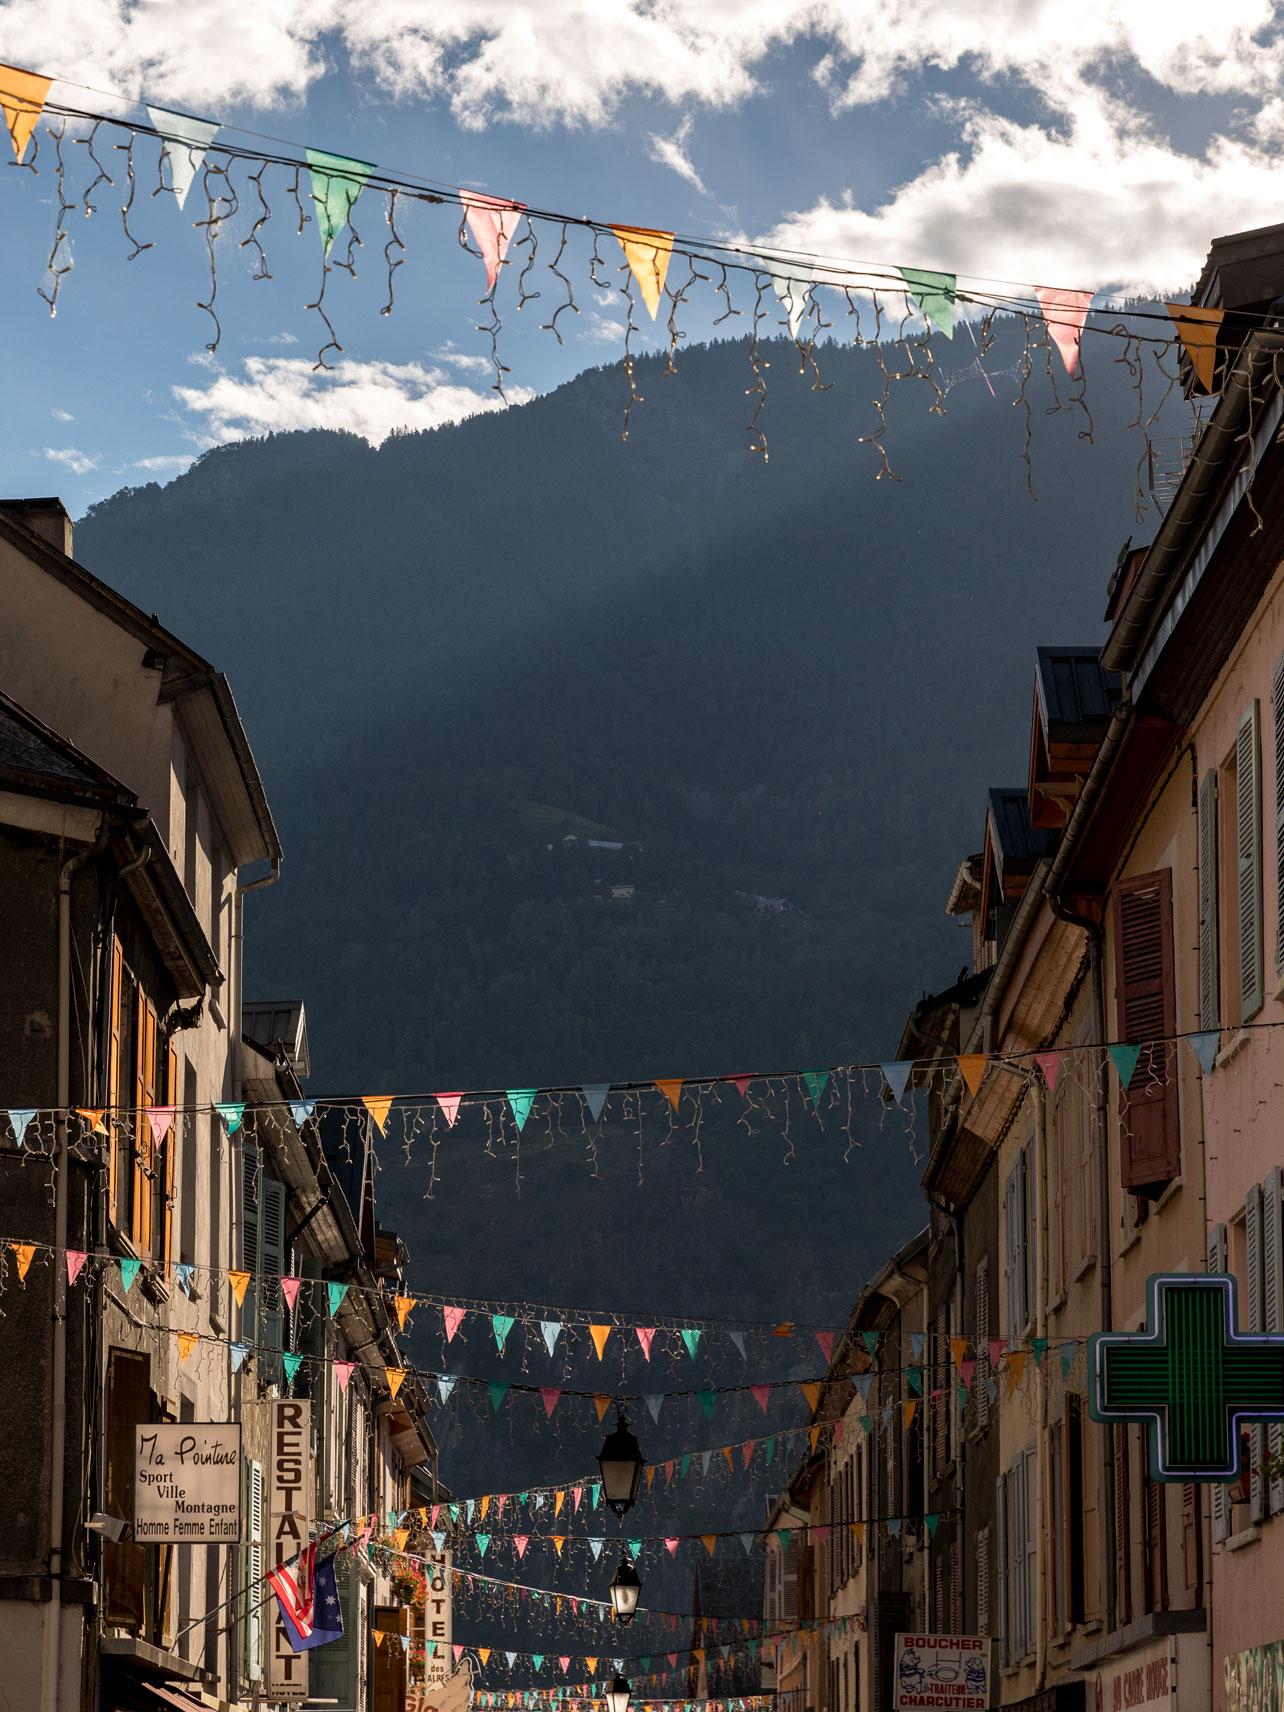 Morning atmosphere in Bourg d'Oisans.